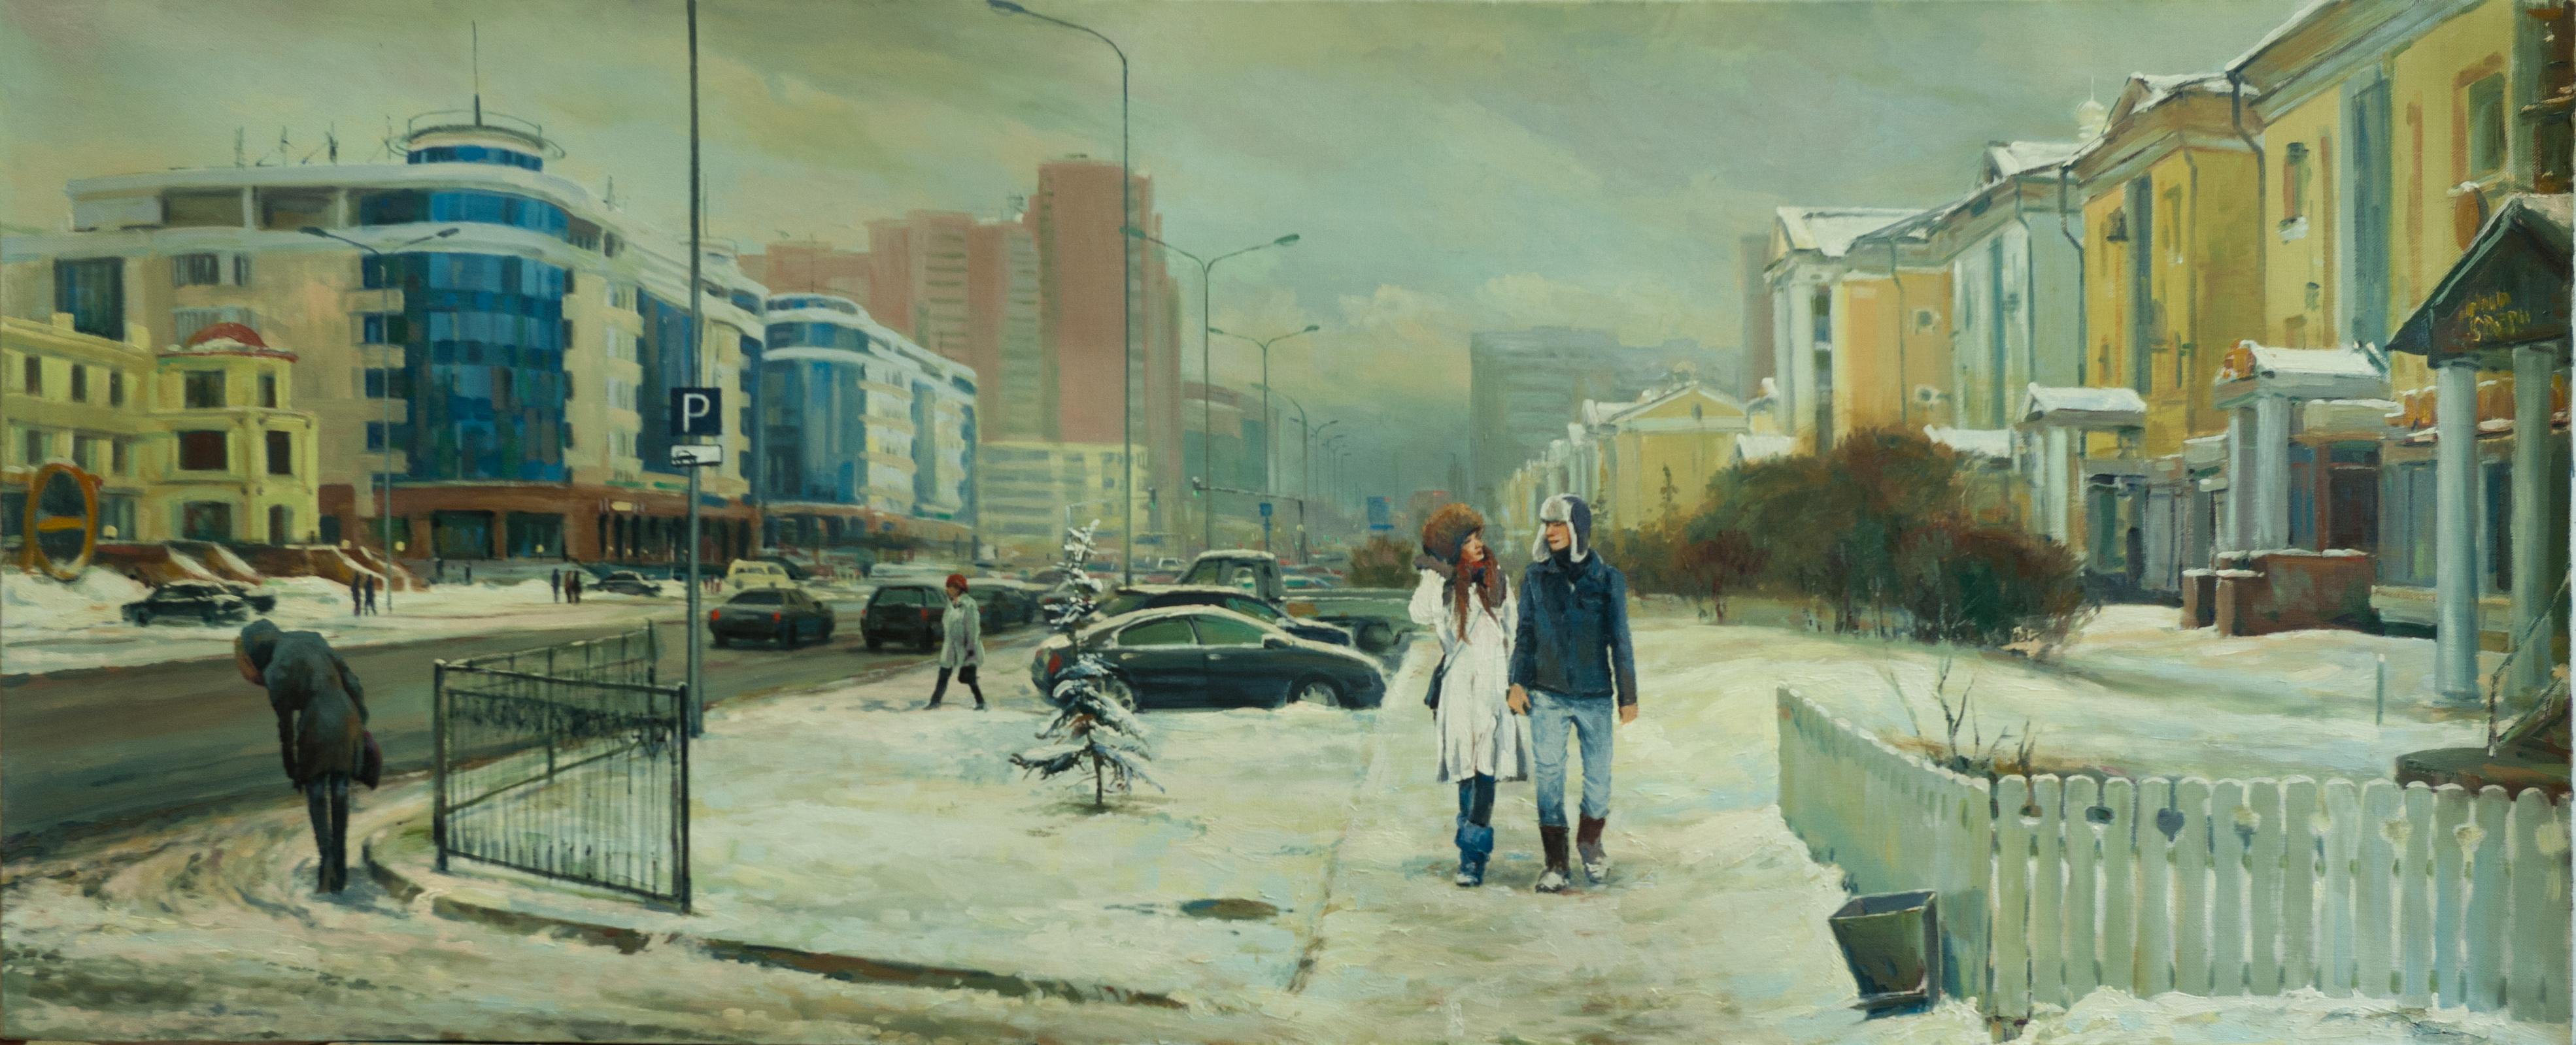 """Зимний день"" Х.М. 90х180"